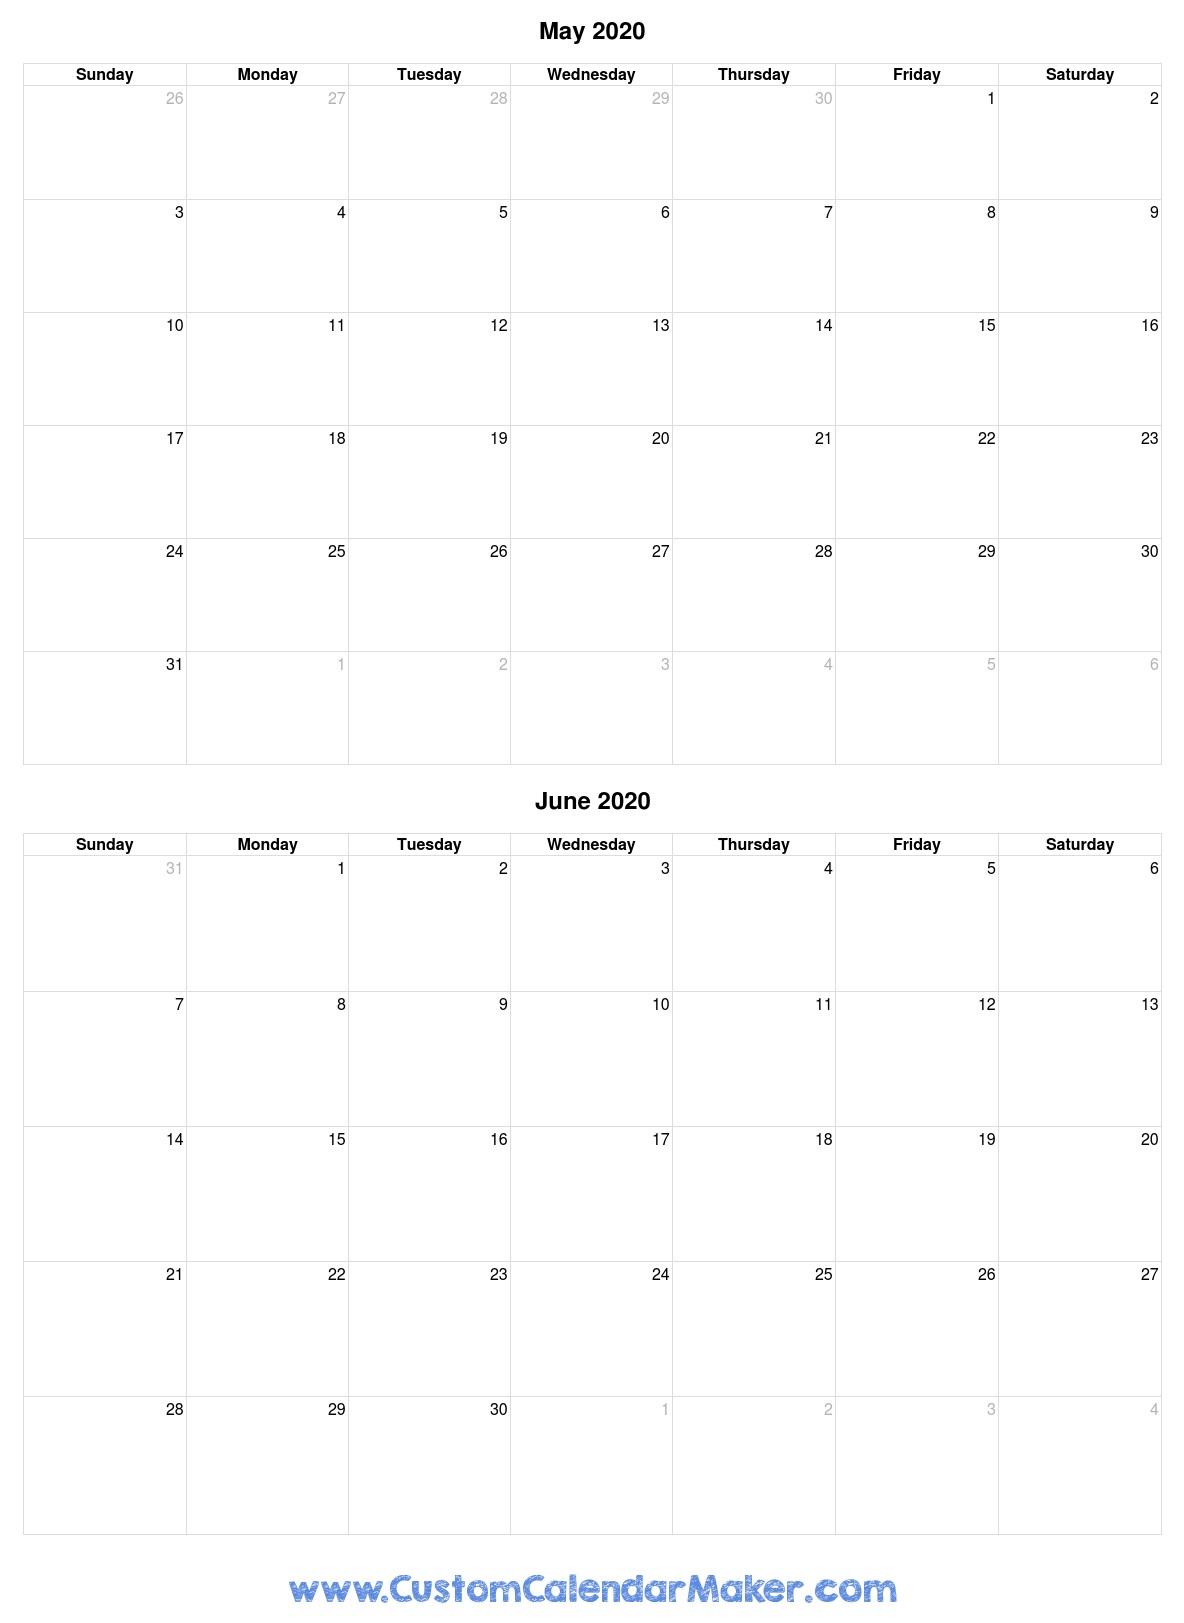 Free Printable Calendars Blank Pdf Templates To Print A